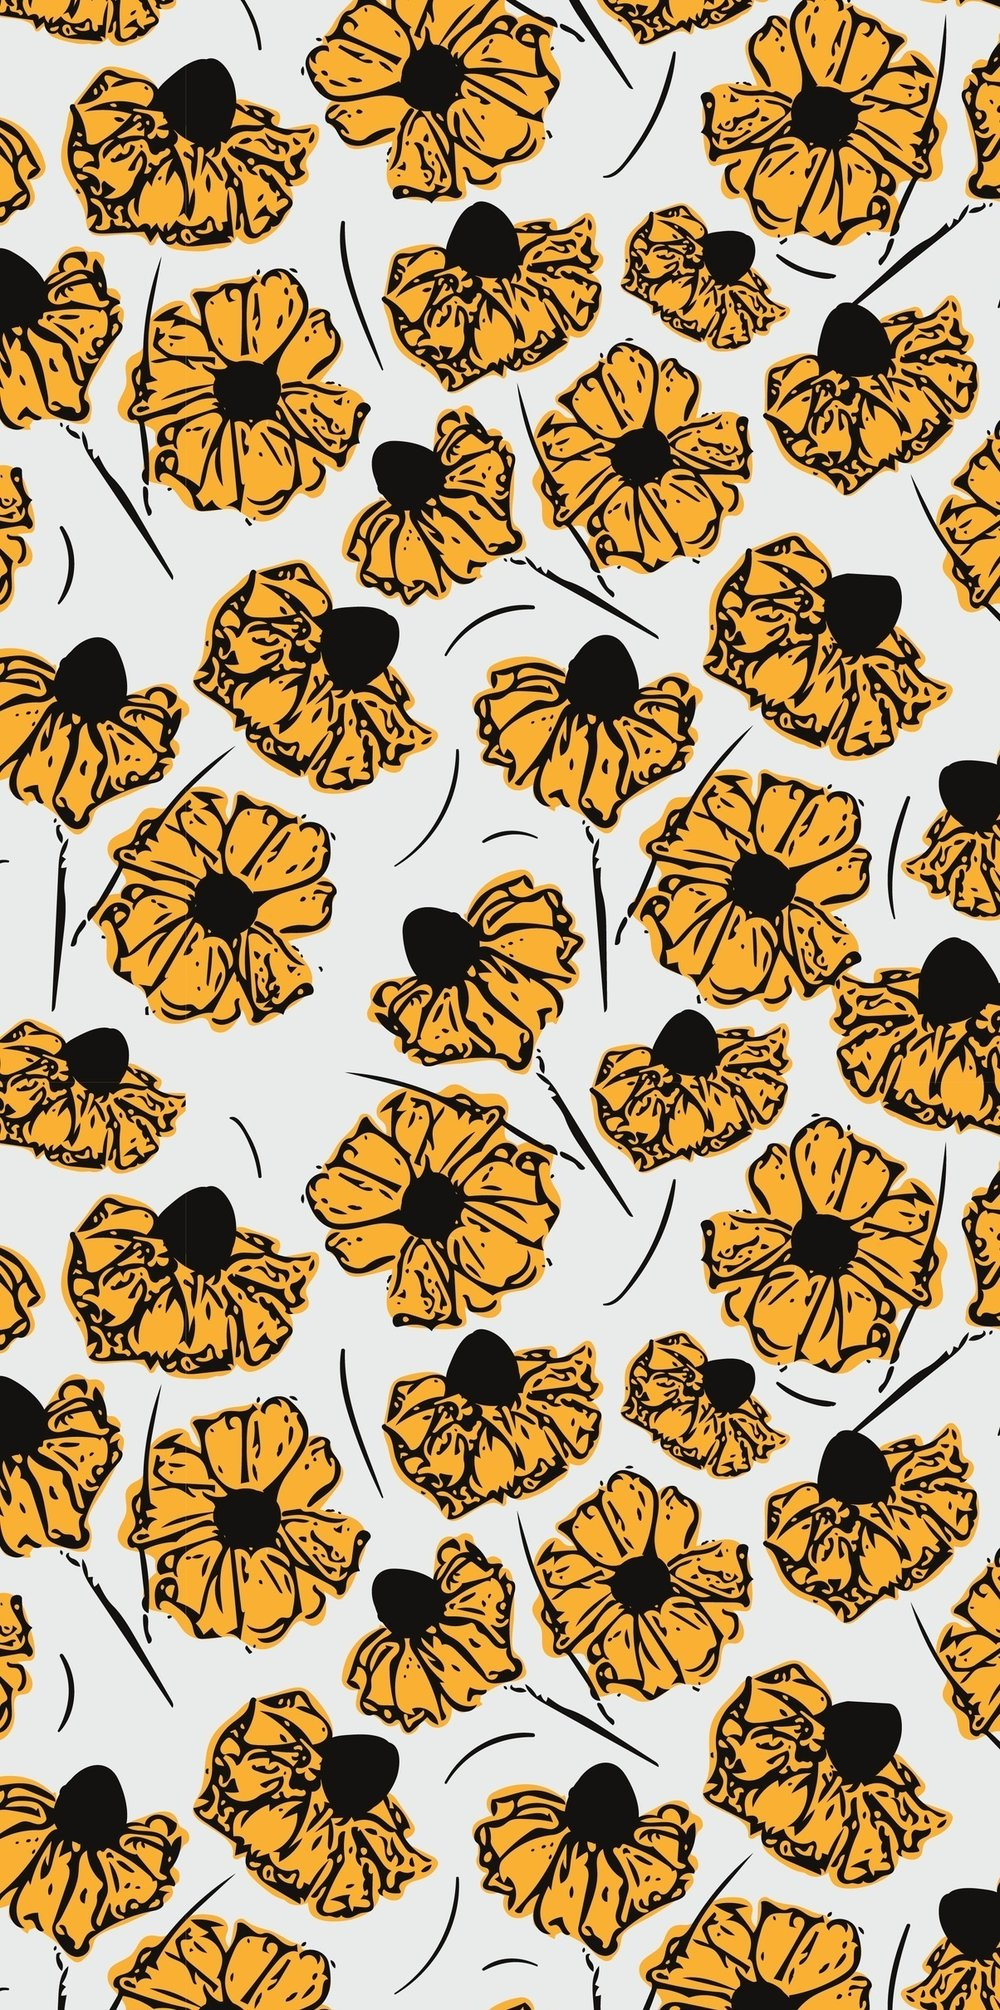 florals%252Bpatter-01.jpg